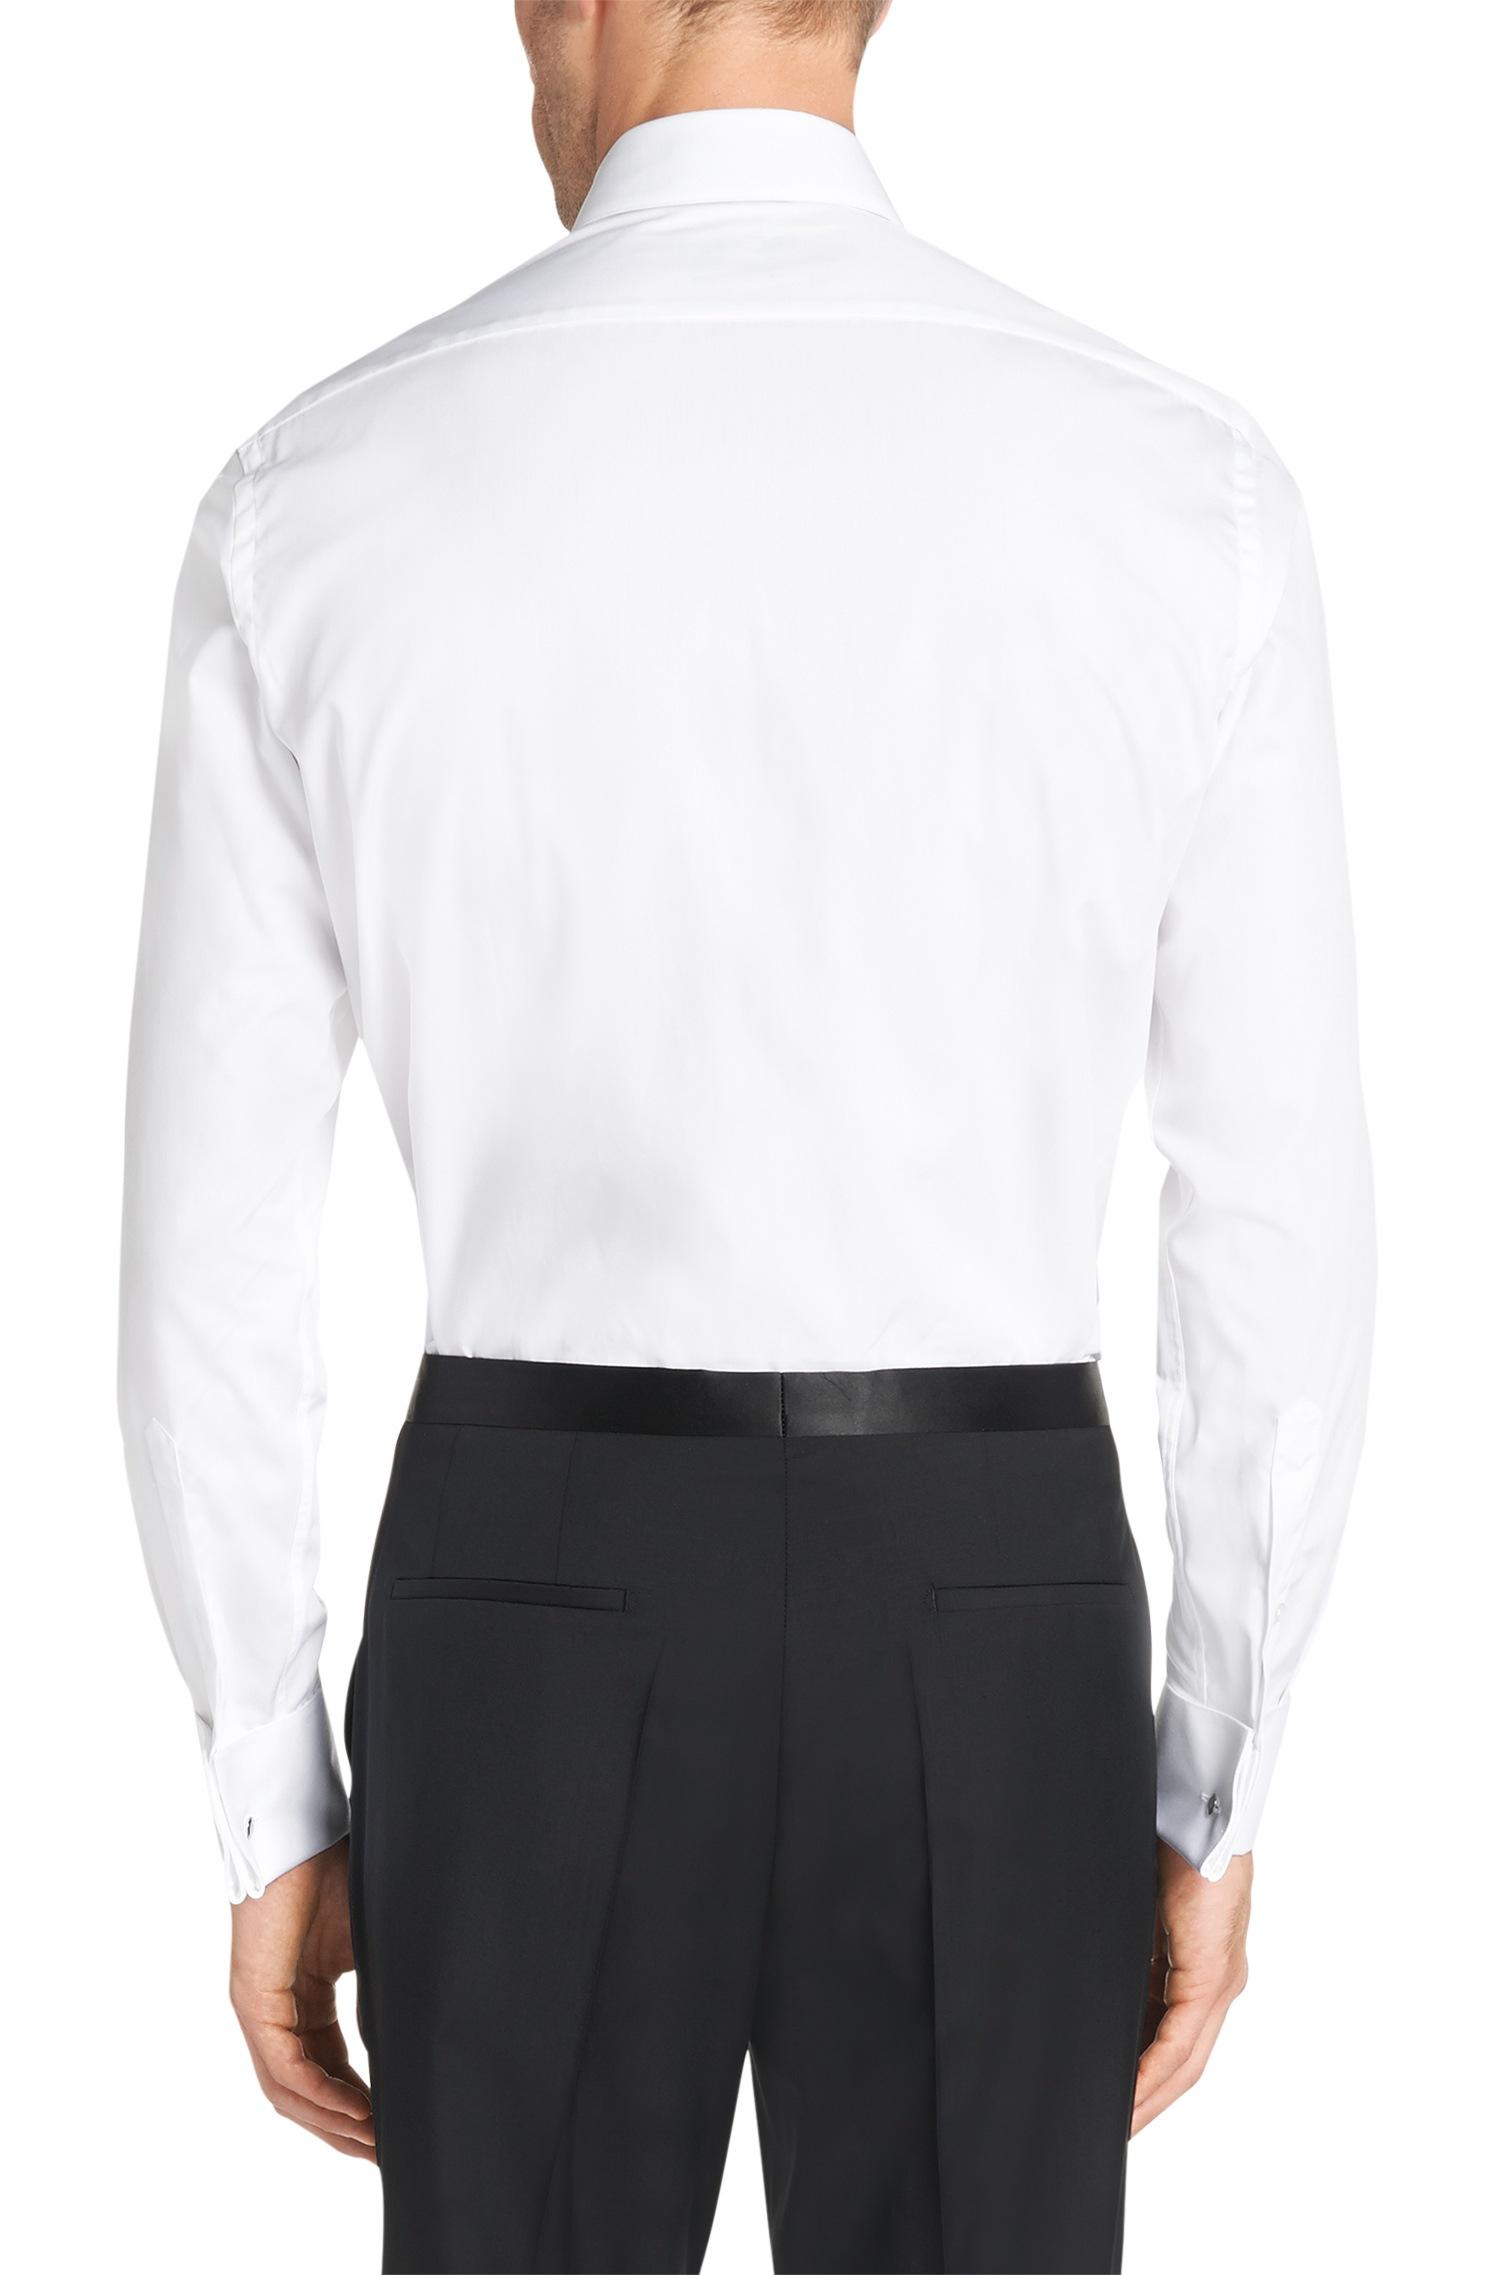 Boss regular fit dress shirt in easy iron cotton 39 grant for Regular fit dress shirt